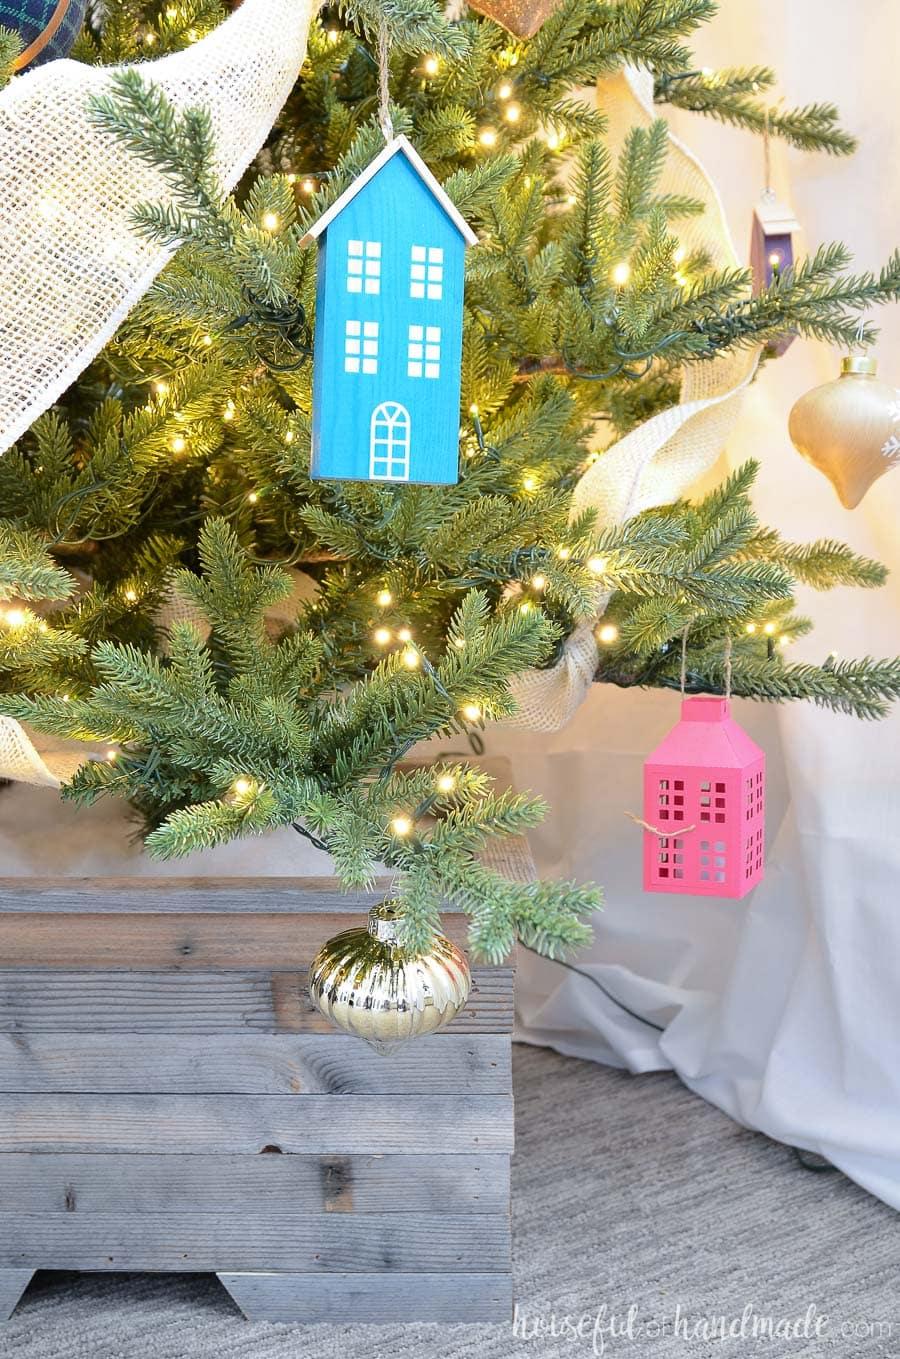 How To Make A Wood Christmas Tree Stand Houseful Of Handmade